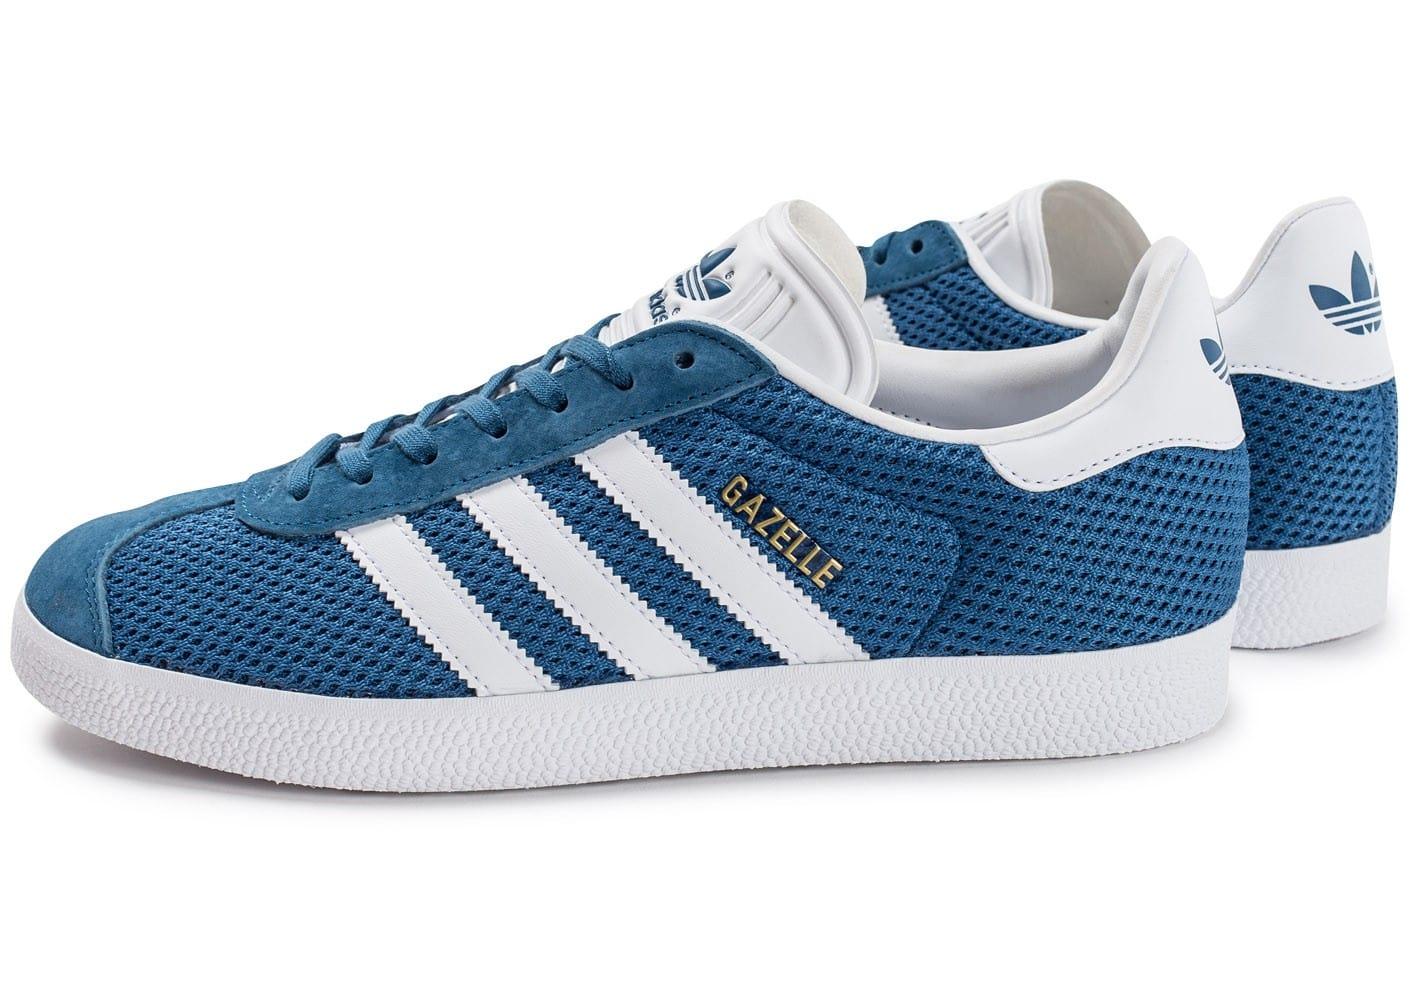 adidas dragons homme bleu